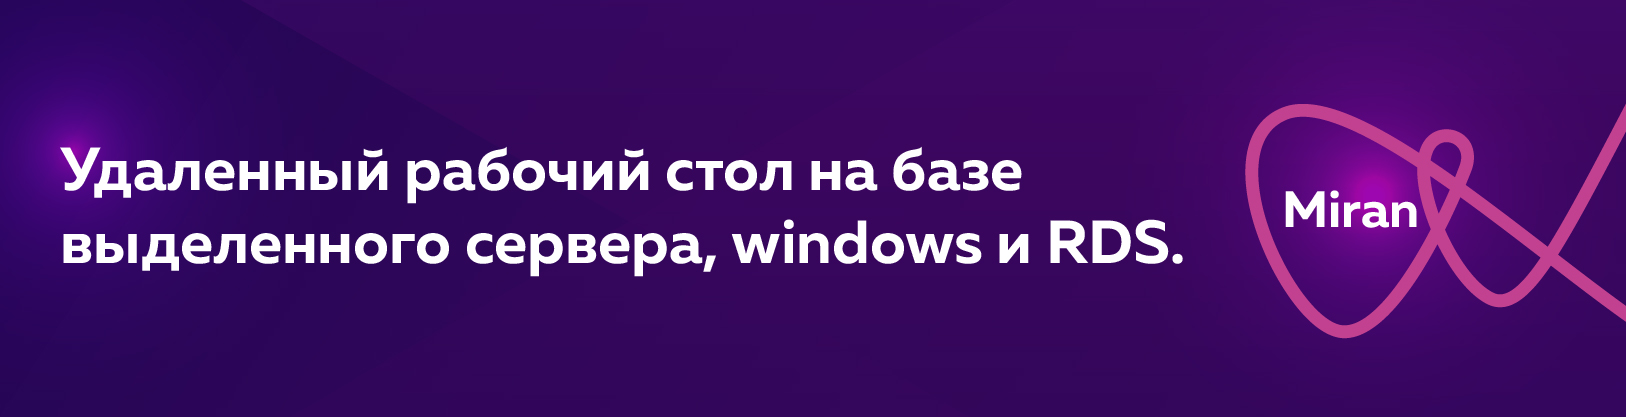 ssl - Ошибка сертификата при открытии сайта с уcтройства Android - Stack Overflow на русском